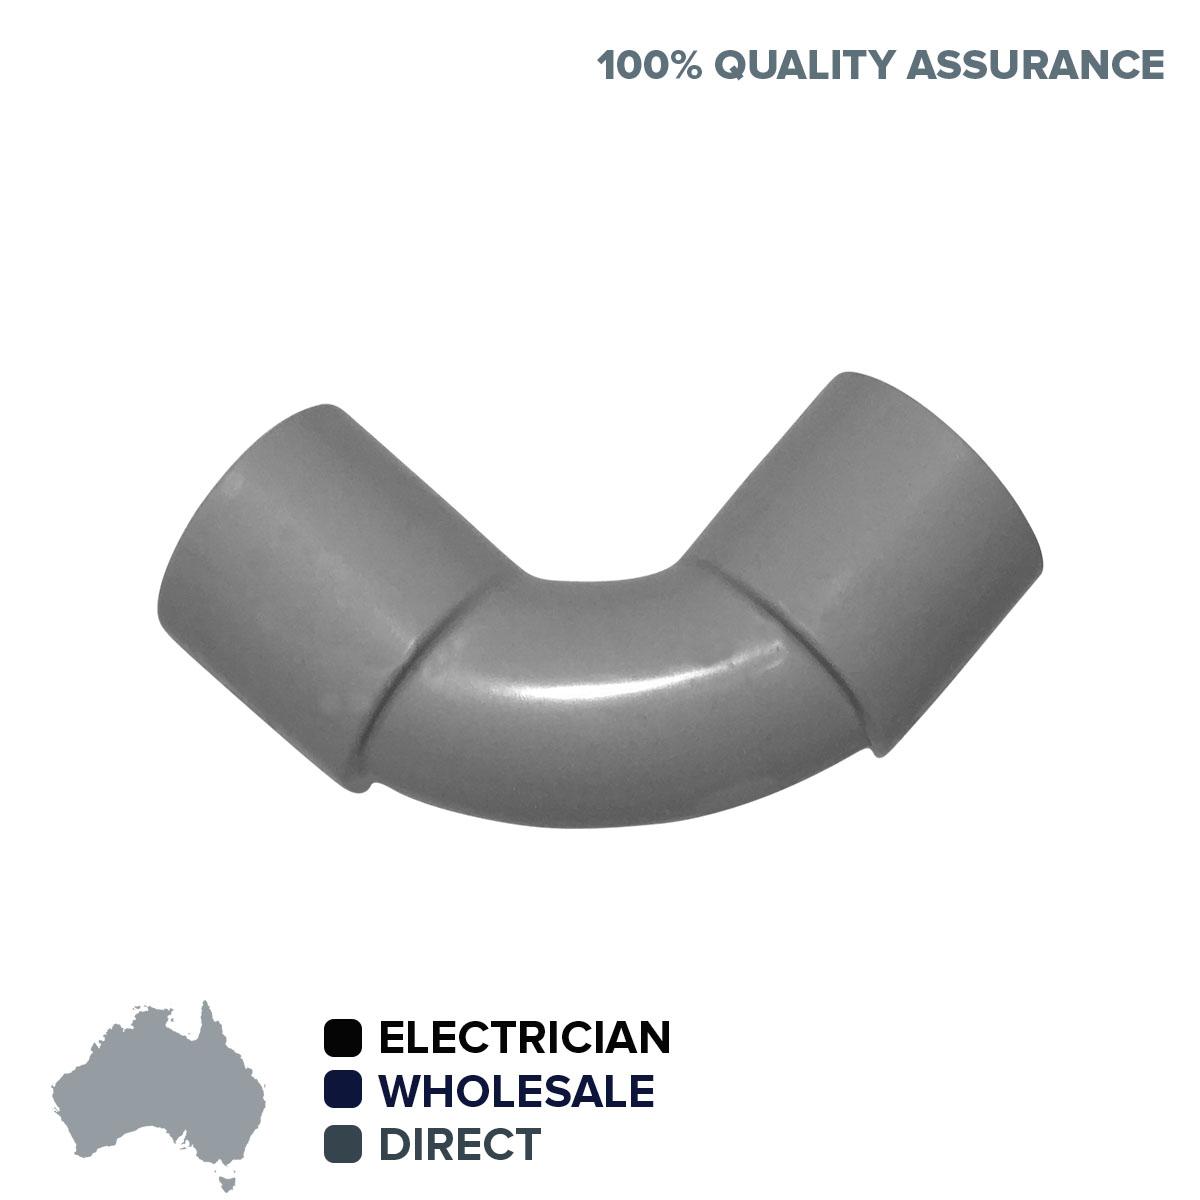 BULK 10 x 20mm 90 degree Elbow Bend Electrical Conduit